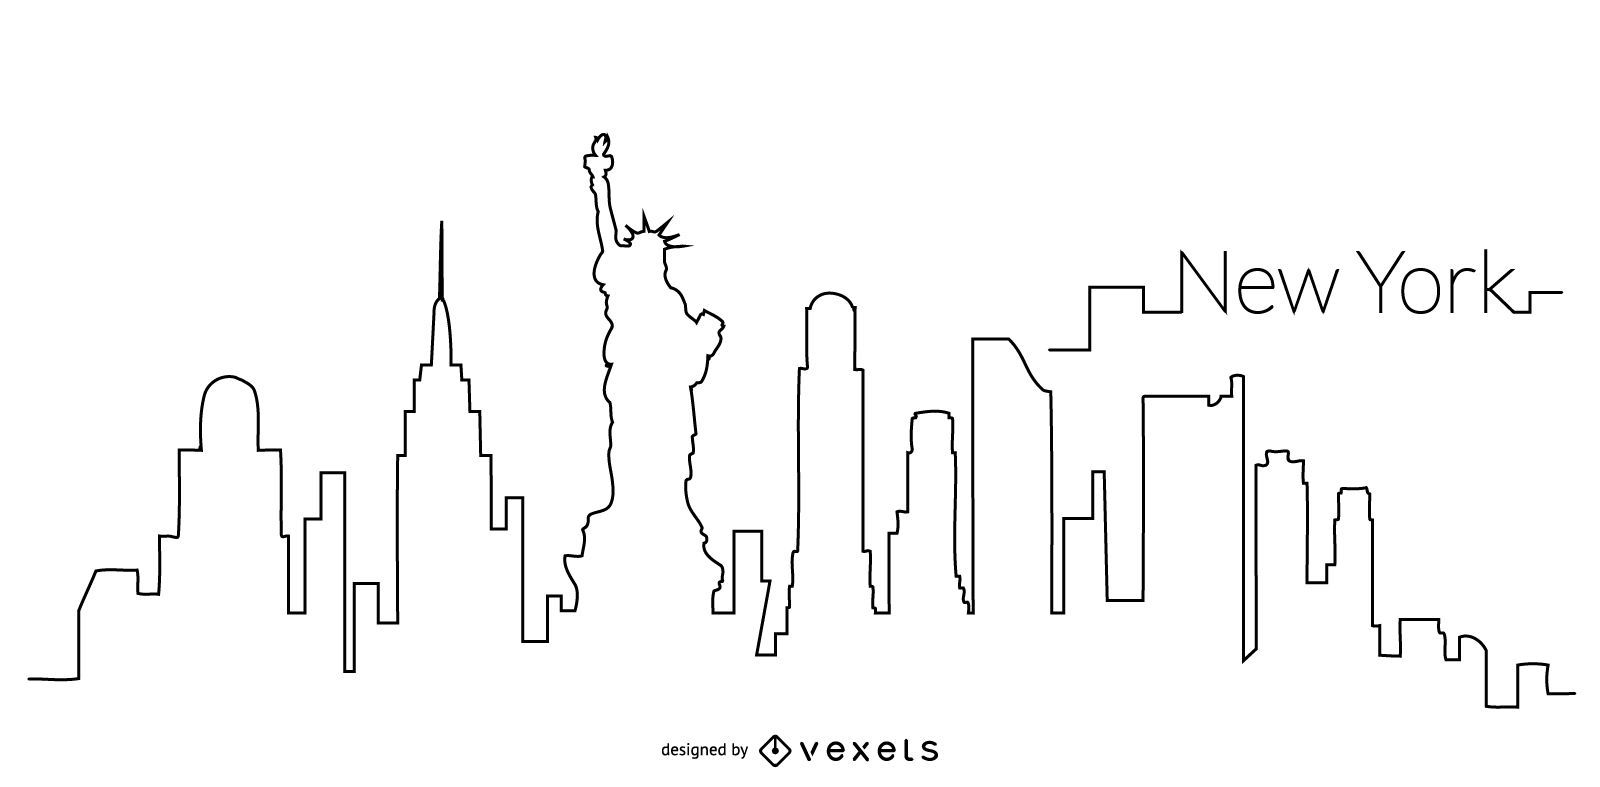 New York Skyline Outline